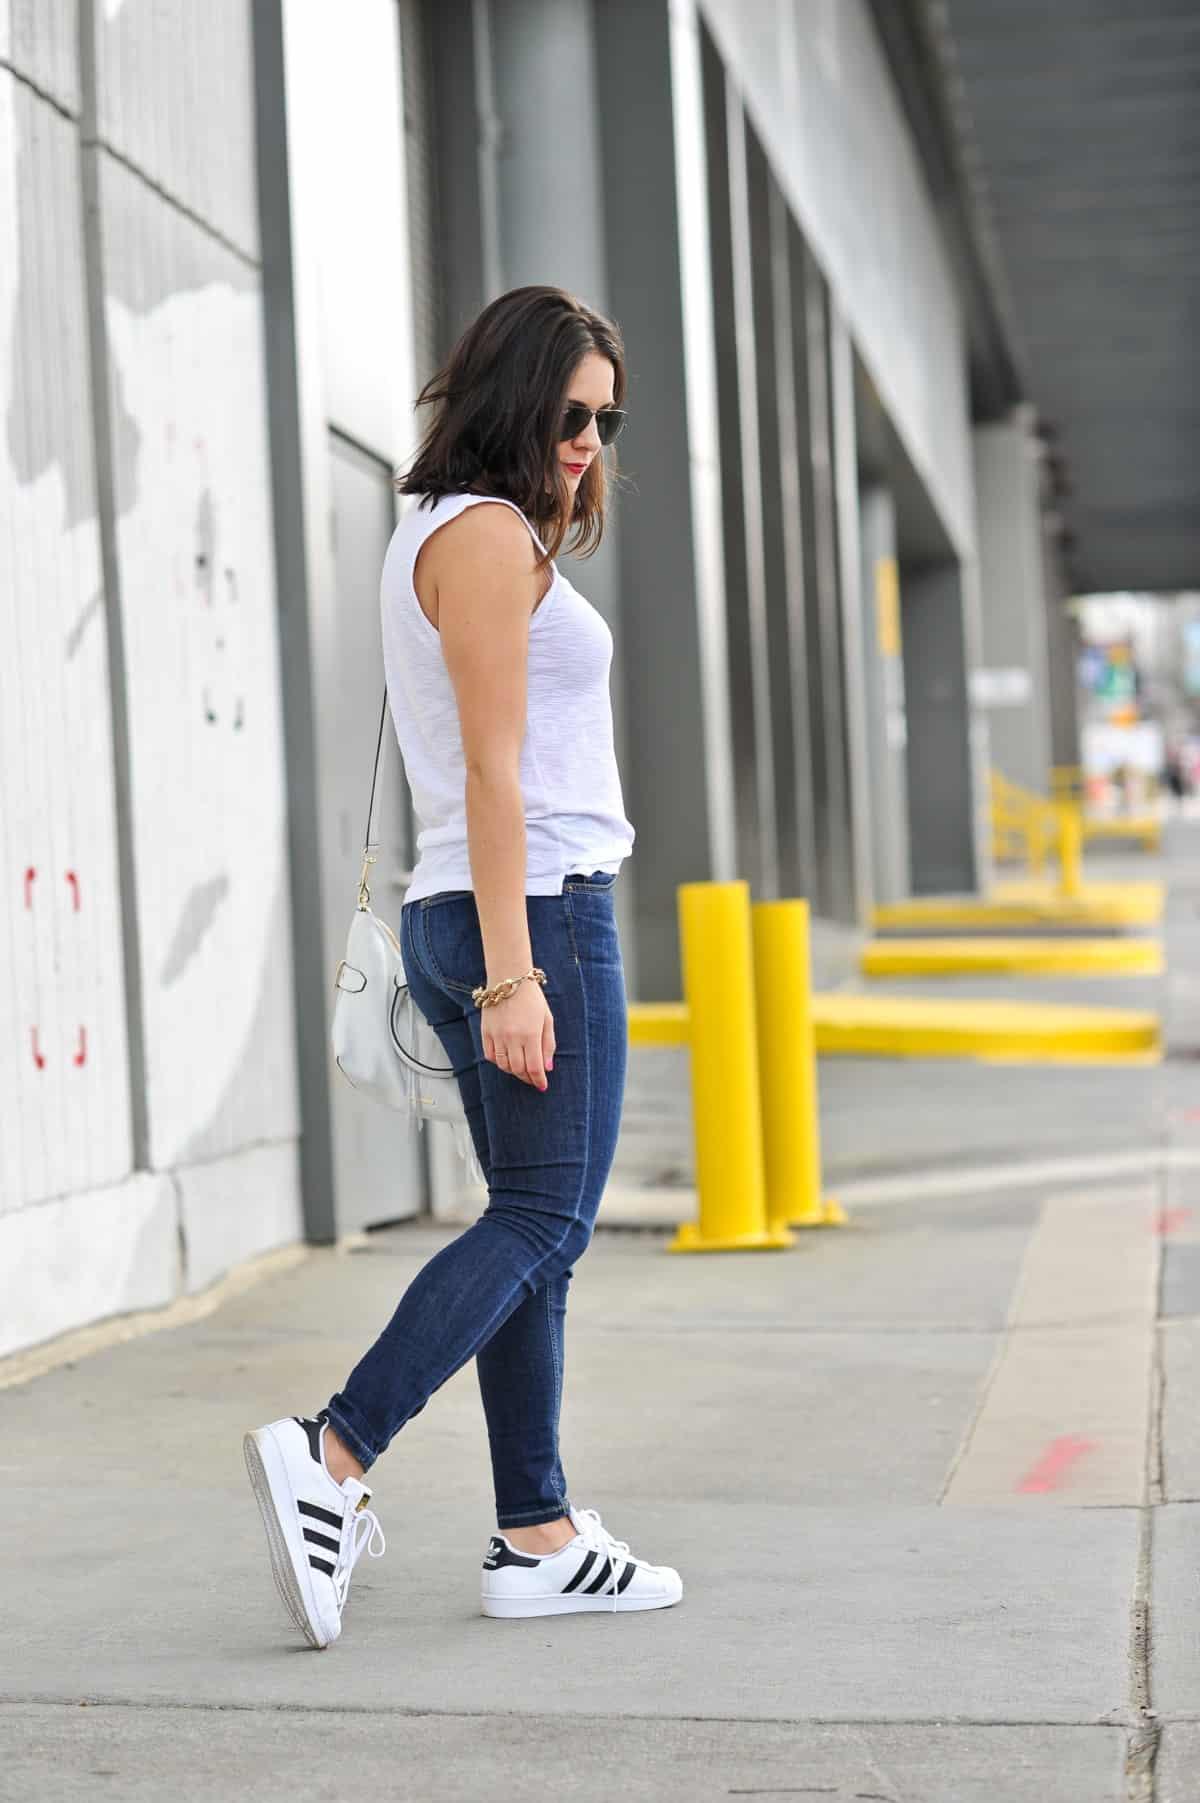 adidas originals, street style, My Style Vita - @mystylevita - 15